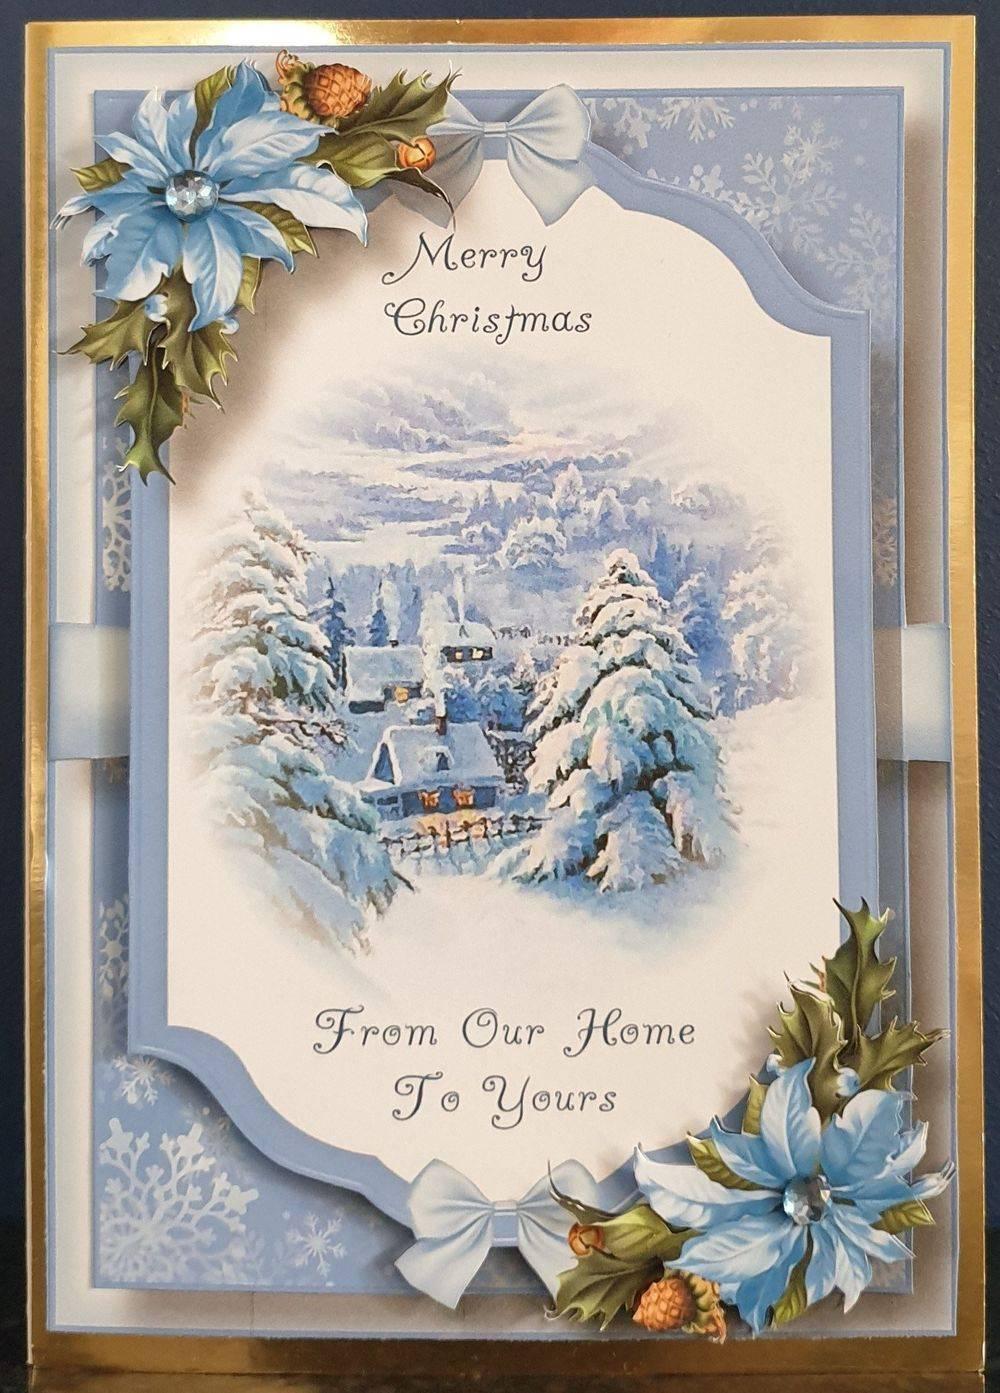 Snowy Village - Beautiful Christmas Scene